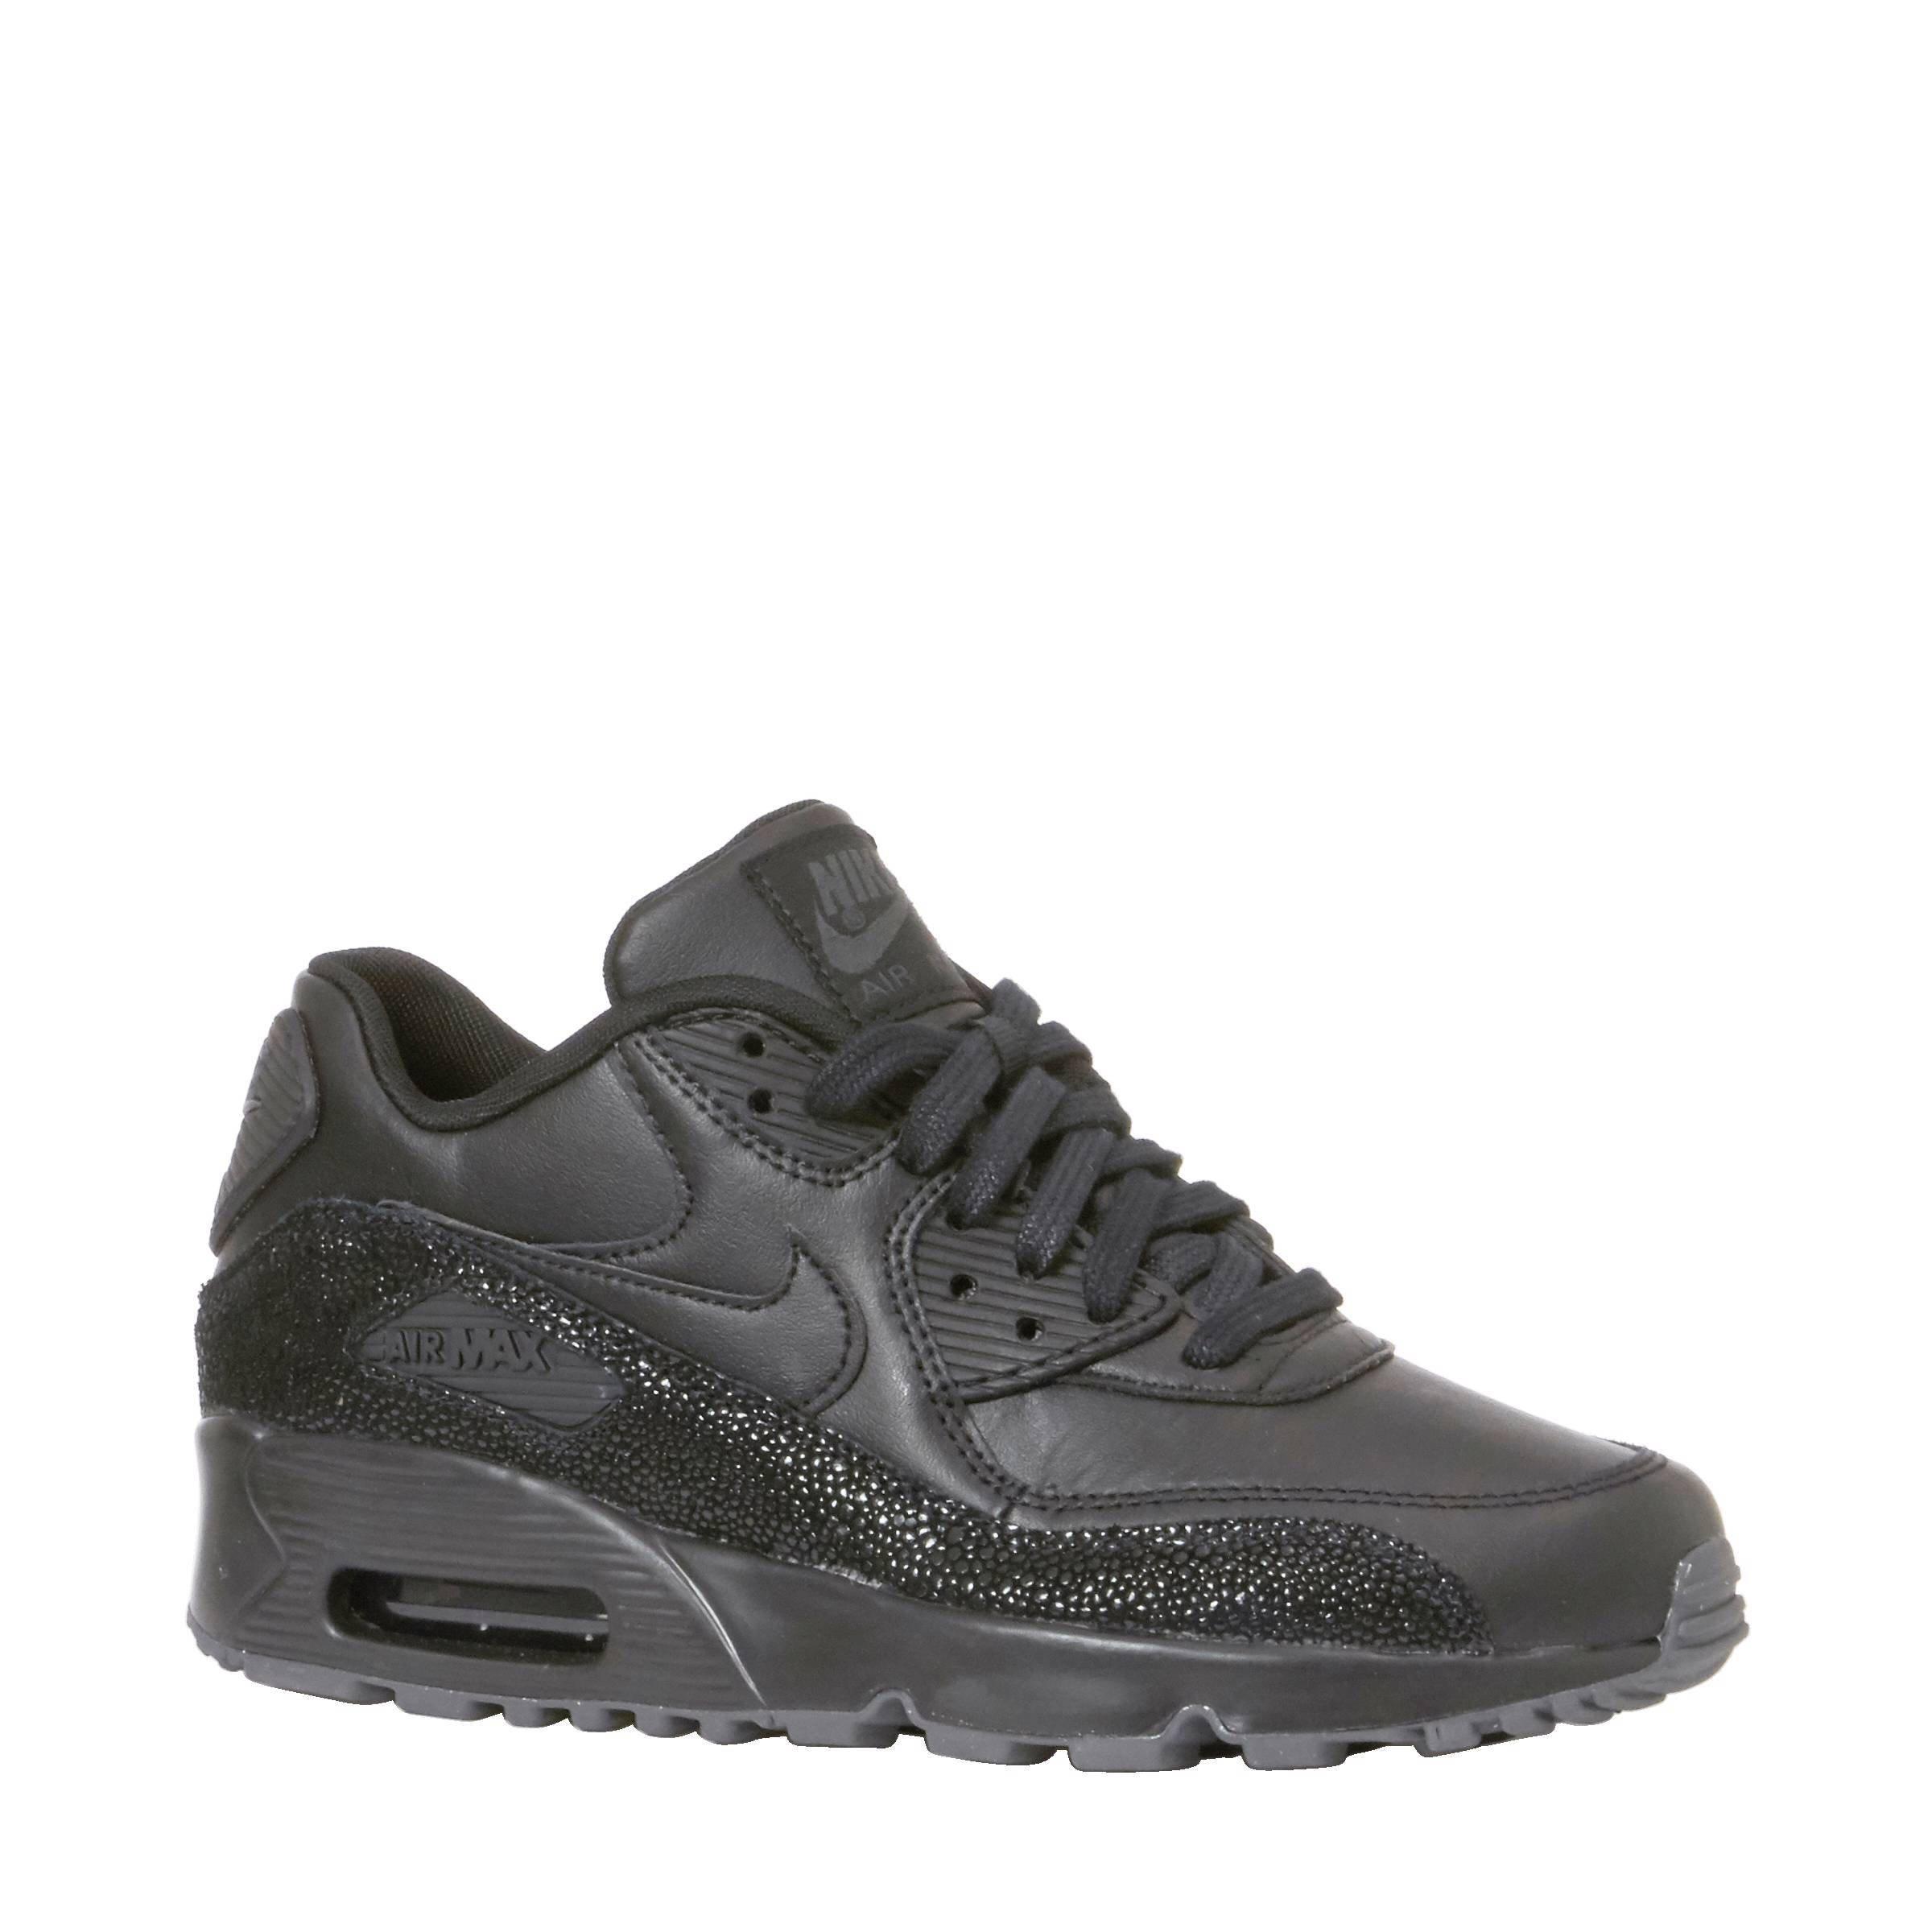 ecffae98f16 nike-air-max-90-se-ltr-sneakers-zwart-0886551024548.jpg